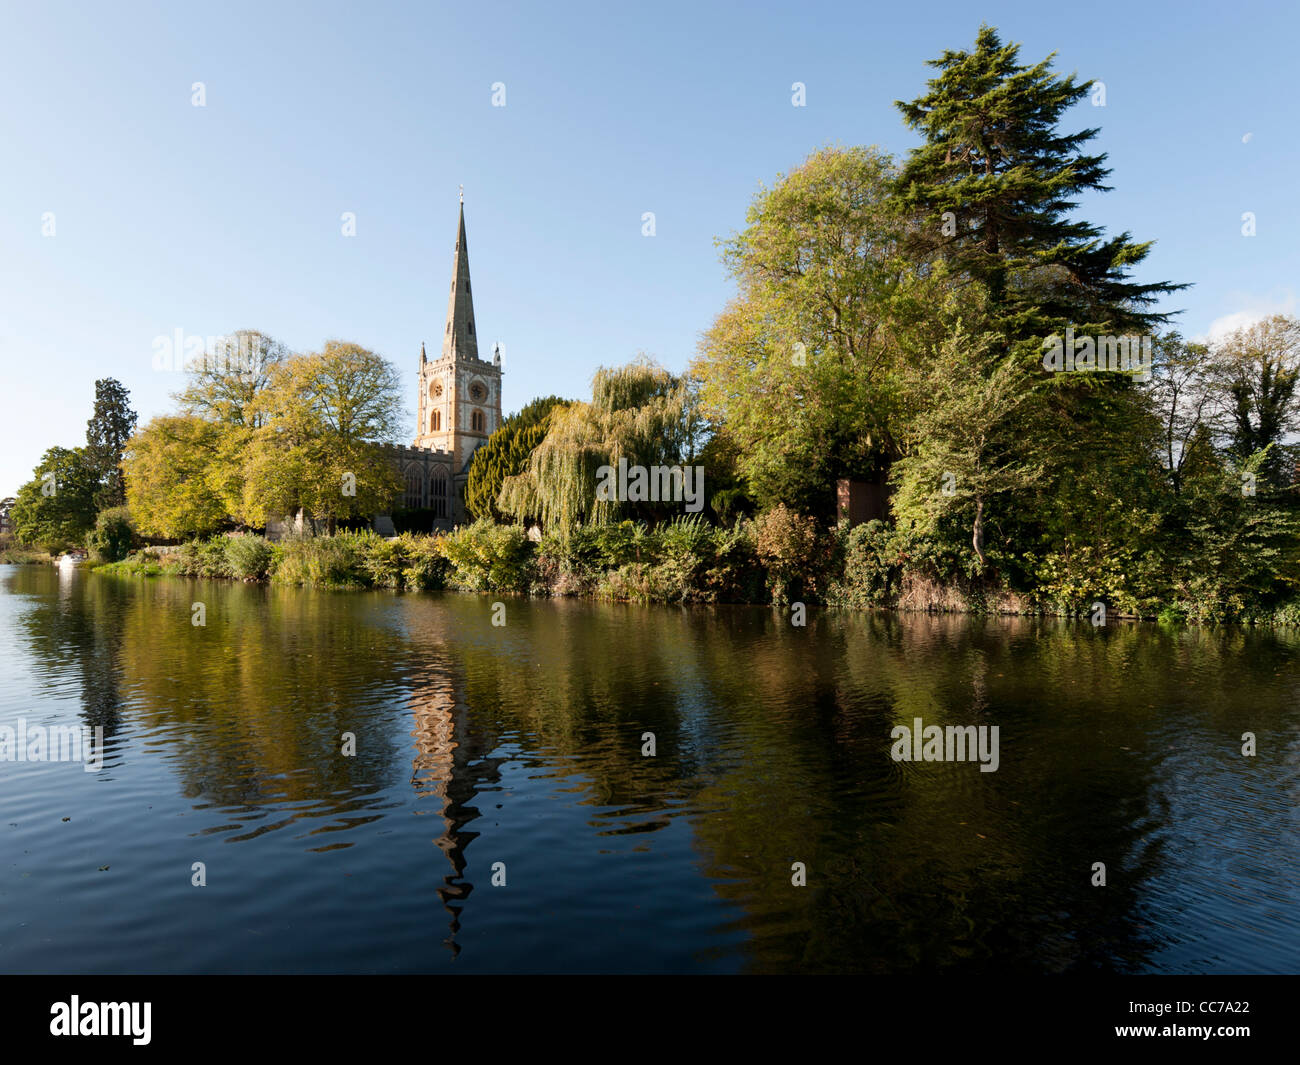 Holy Trinity Church, Stratford-upon-Avon, Warwickshire, England, UK - Stock Image